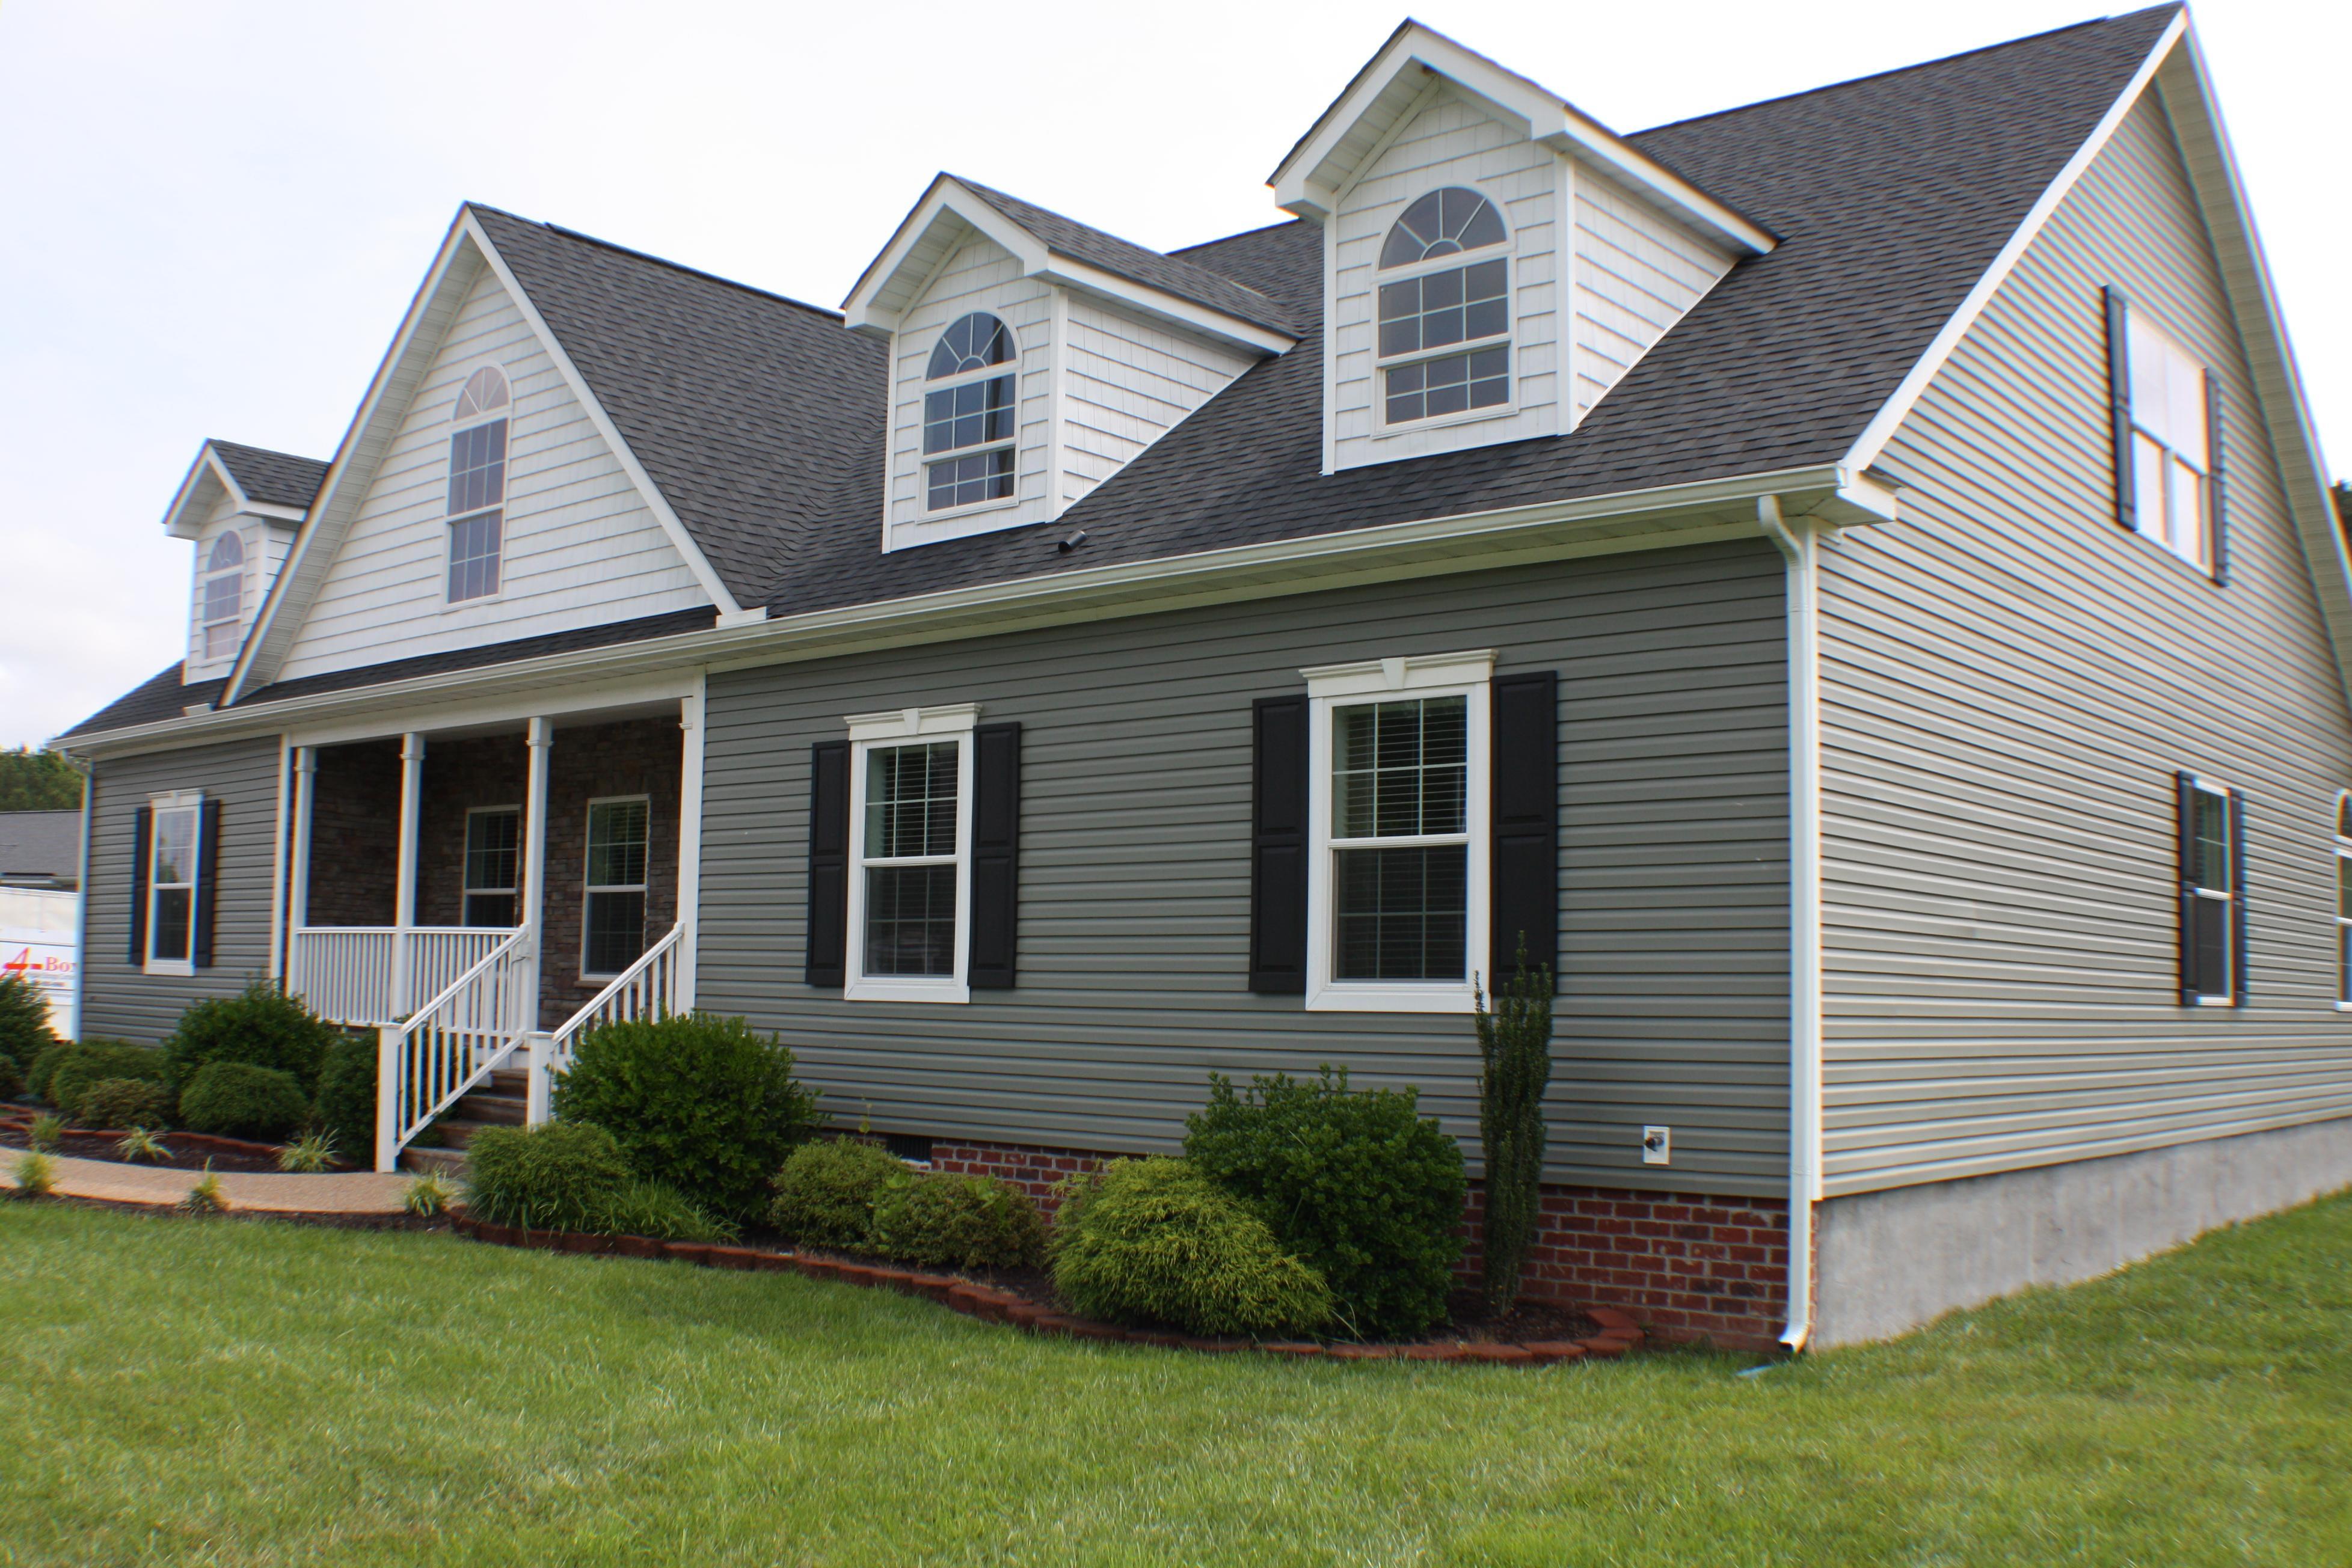 Oakwood homes in glen allen va 804 798 9 for The oakwood